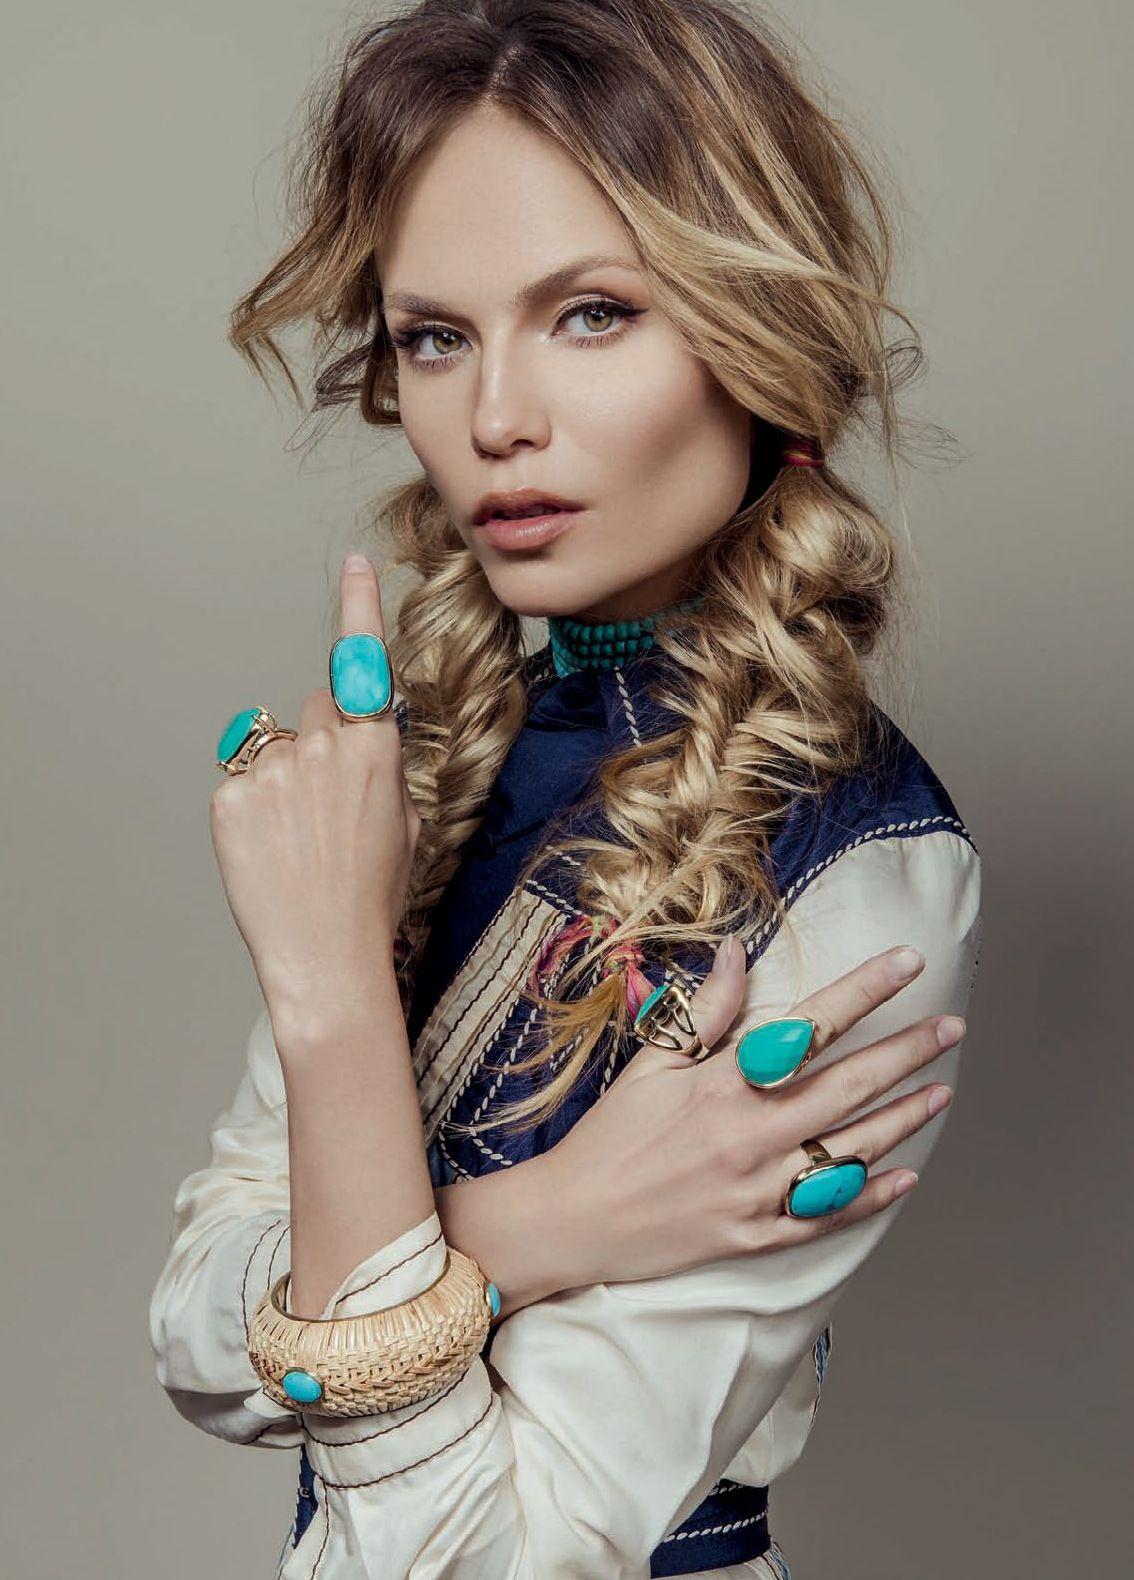 Natasha Poly by Zee Nunes for Vogue Brazil February 2015